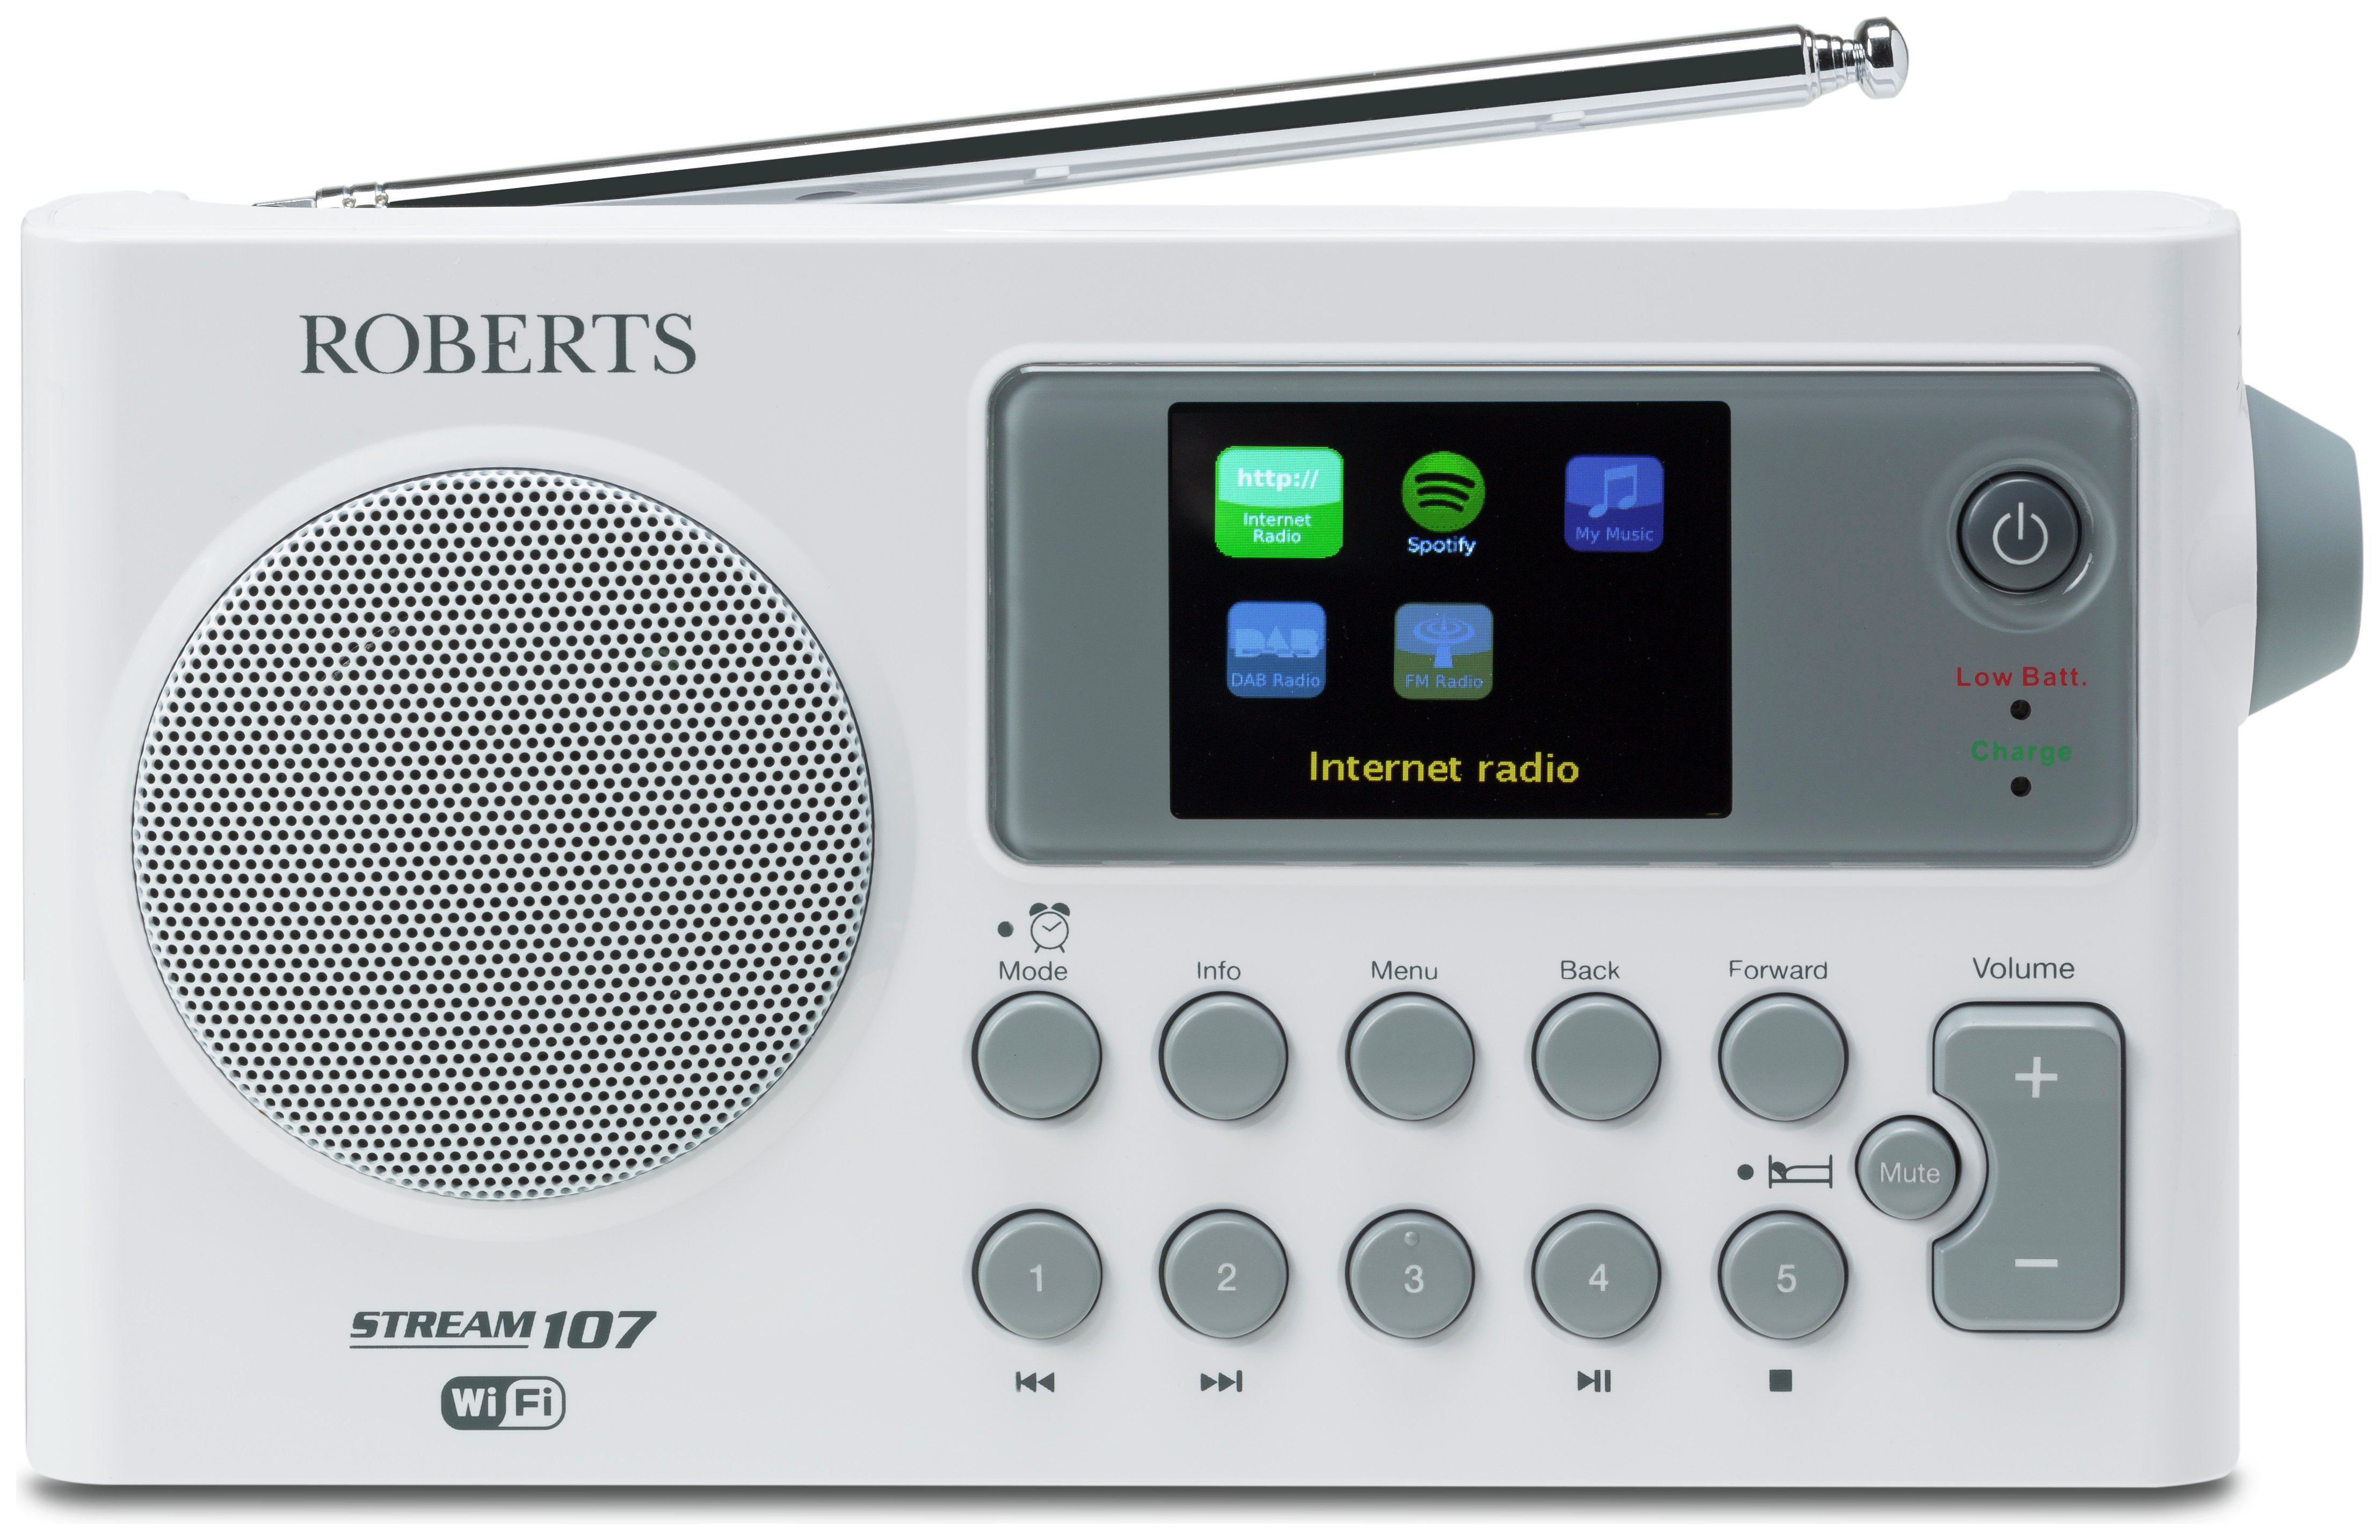 Roberts - Radio Stream107 Internet Radio